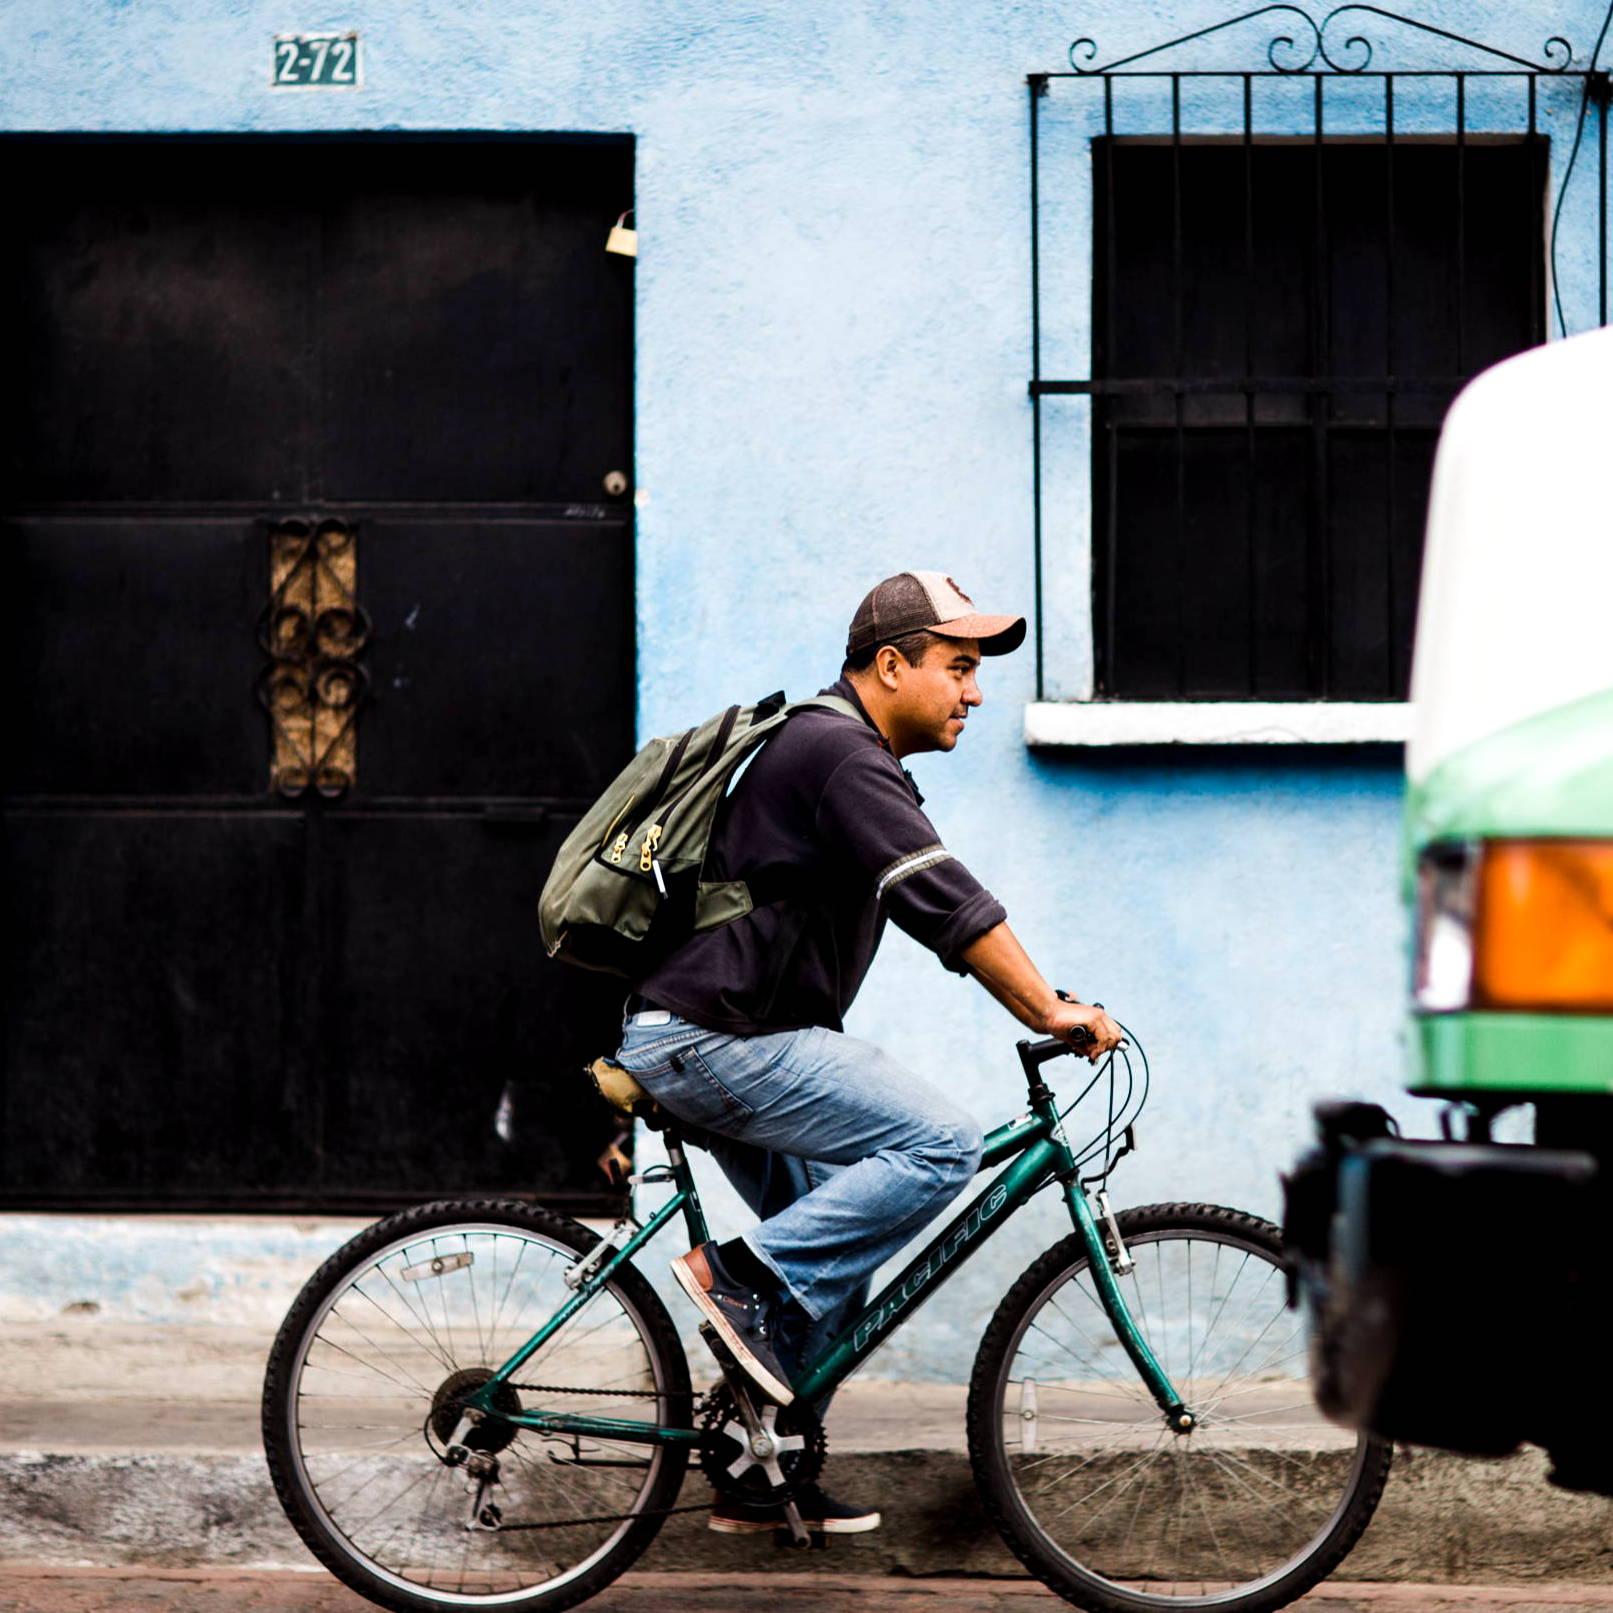 Artisan riding a bicycle to work